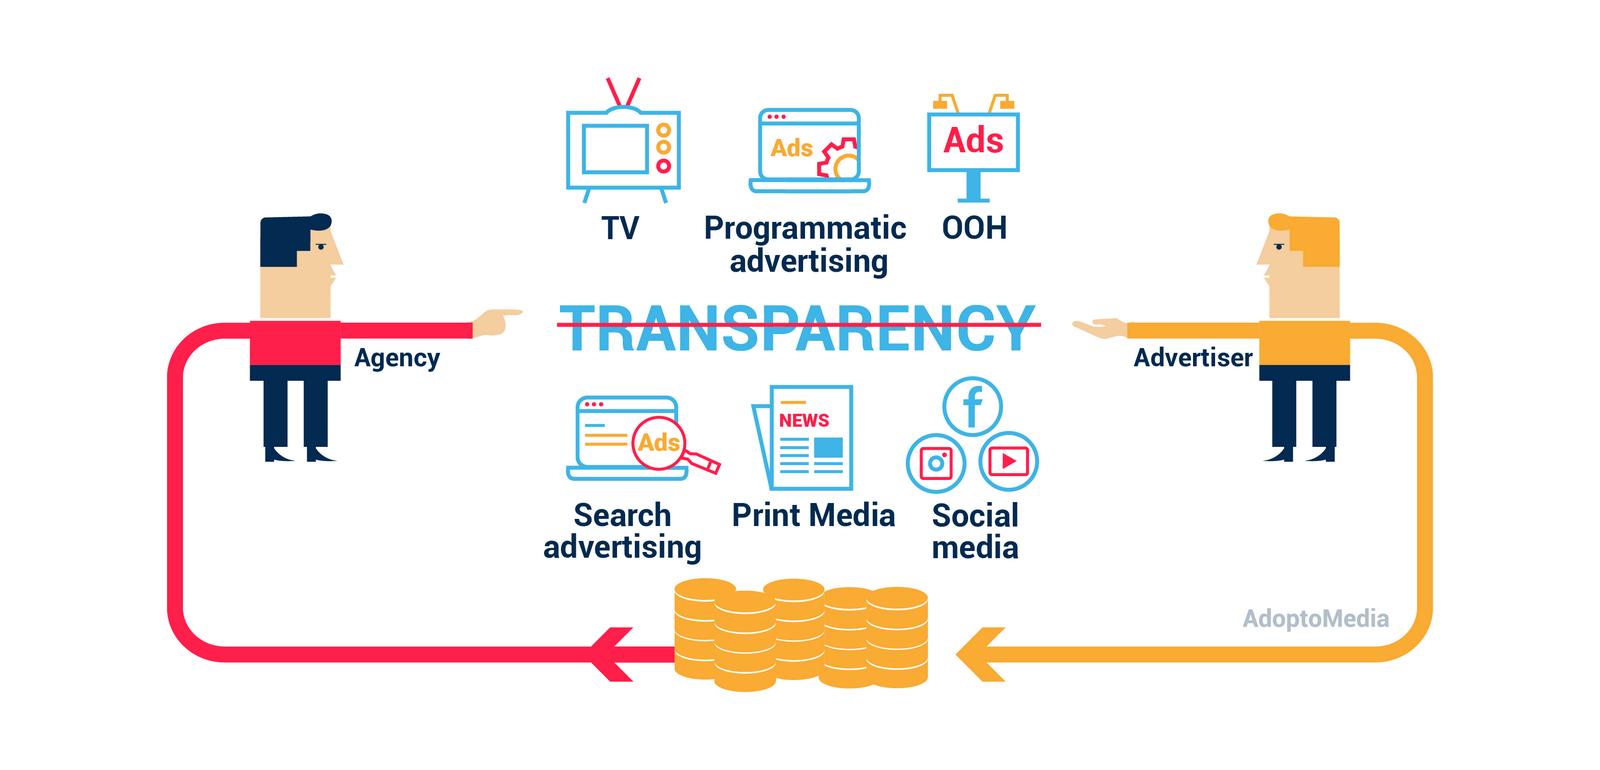 RebateGate, transparency, ad agency, non-transparent media buying, social media advertising, OOH, programmatic advertising, print media, search advertising